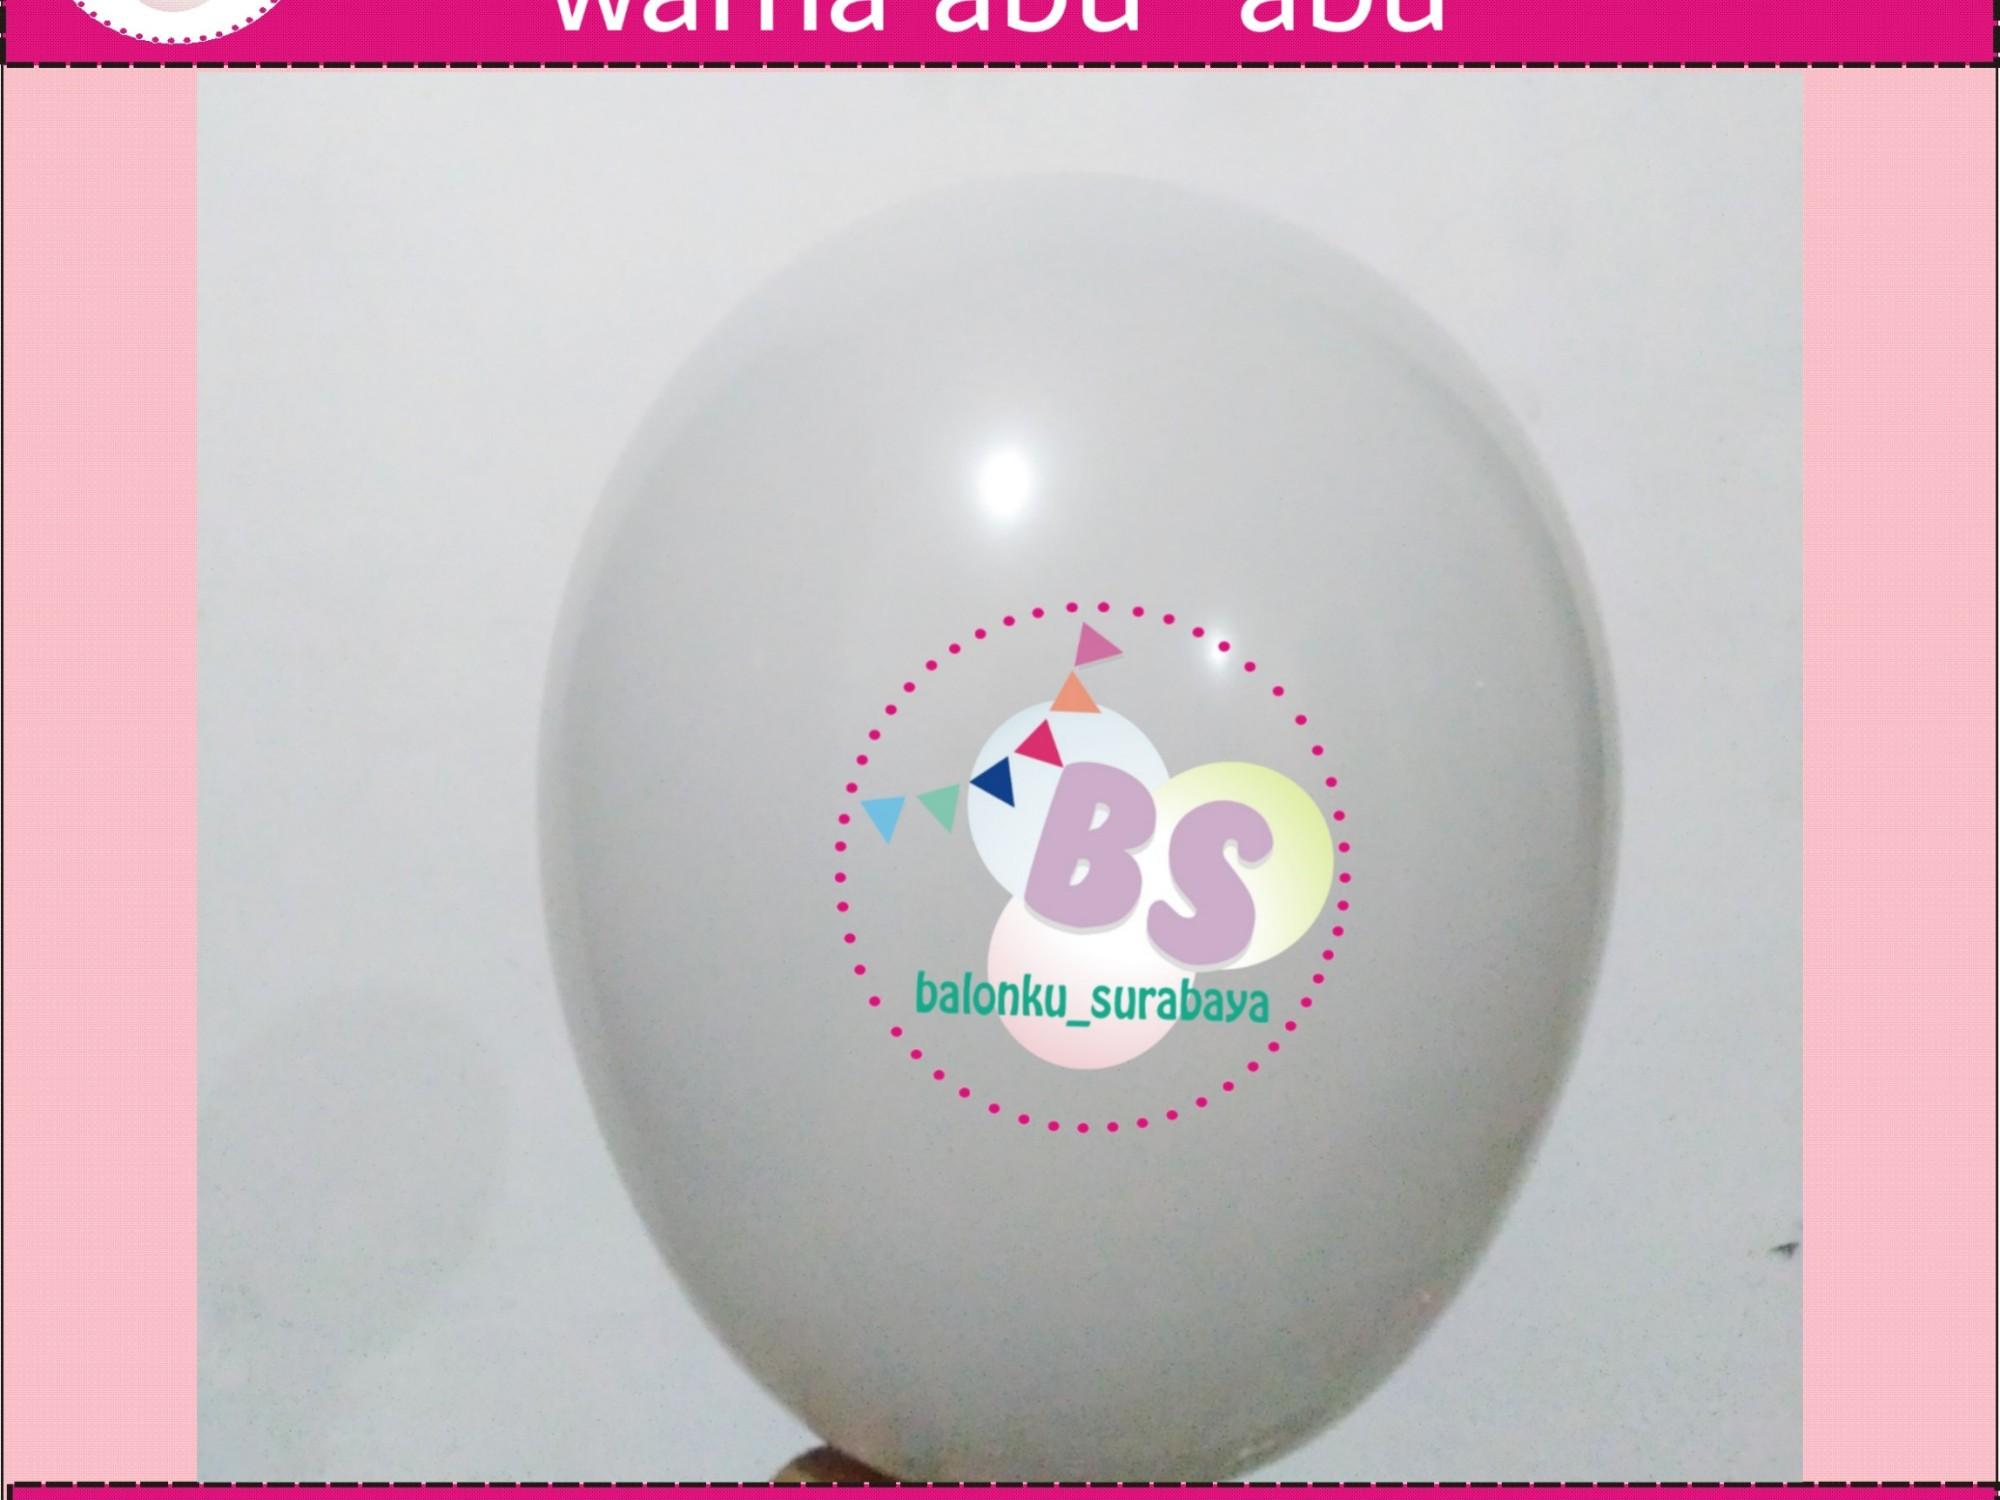 jual balon latex 5 inch abuabu, BAlon Gas,Bunga dekorasi,Rangkaian bunga artificial, Buket bunga, buket bunga mawar, harga buket bunga,Balon sablon, balon Printing, balon promosi, , Perlengkapan ulang tahun, Balon latex , balon doff, balon latex, balon doff merah, balon natal, balon agustusan, balon dekorasi, balonku Surabaya, 085733133529